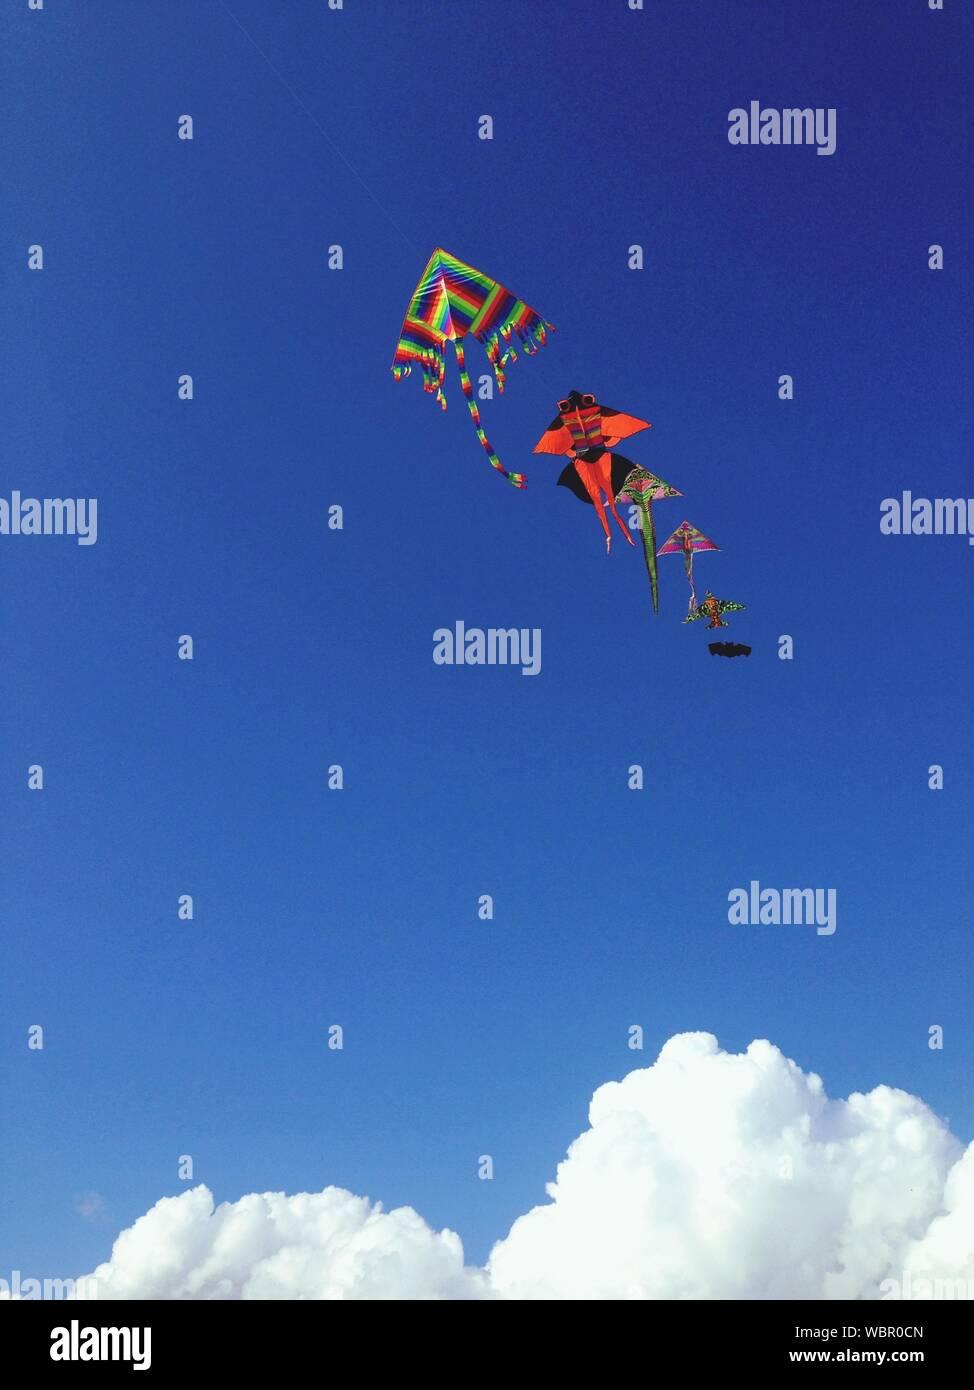 Multi Colored Kites Flying Against Blue Sky Stock Photo